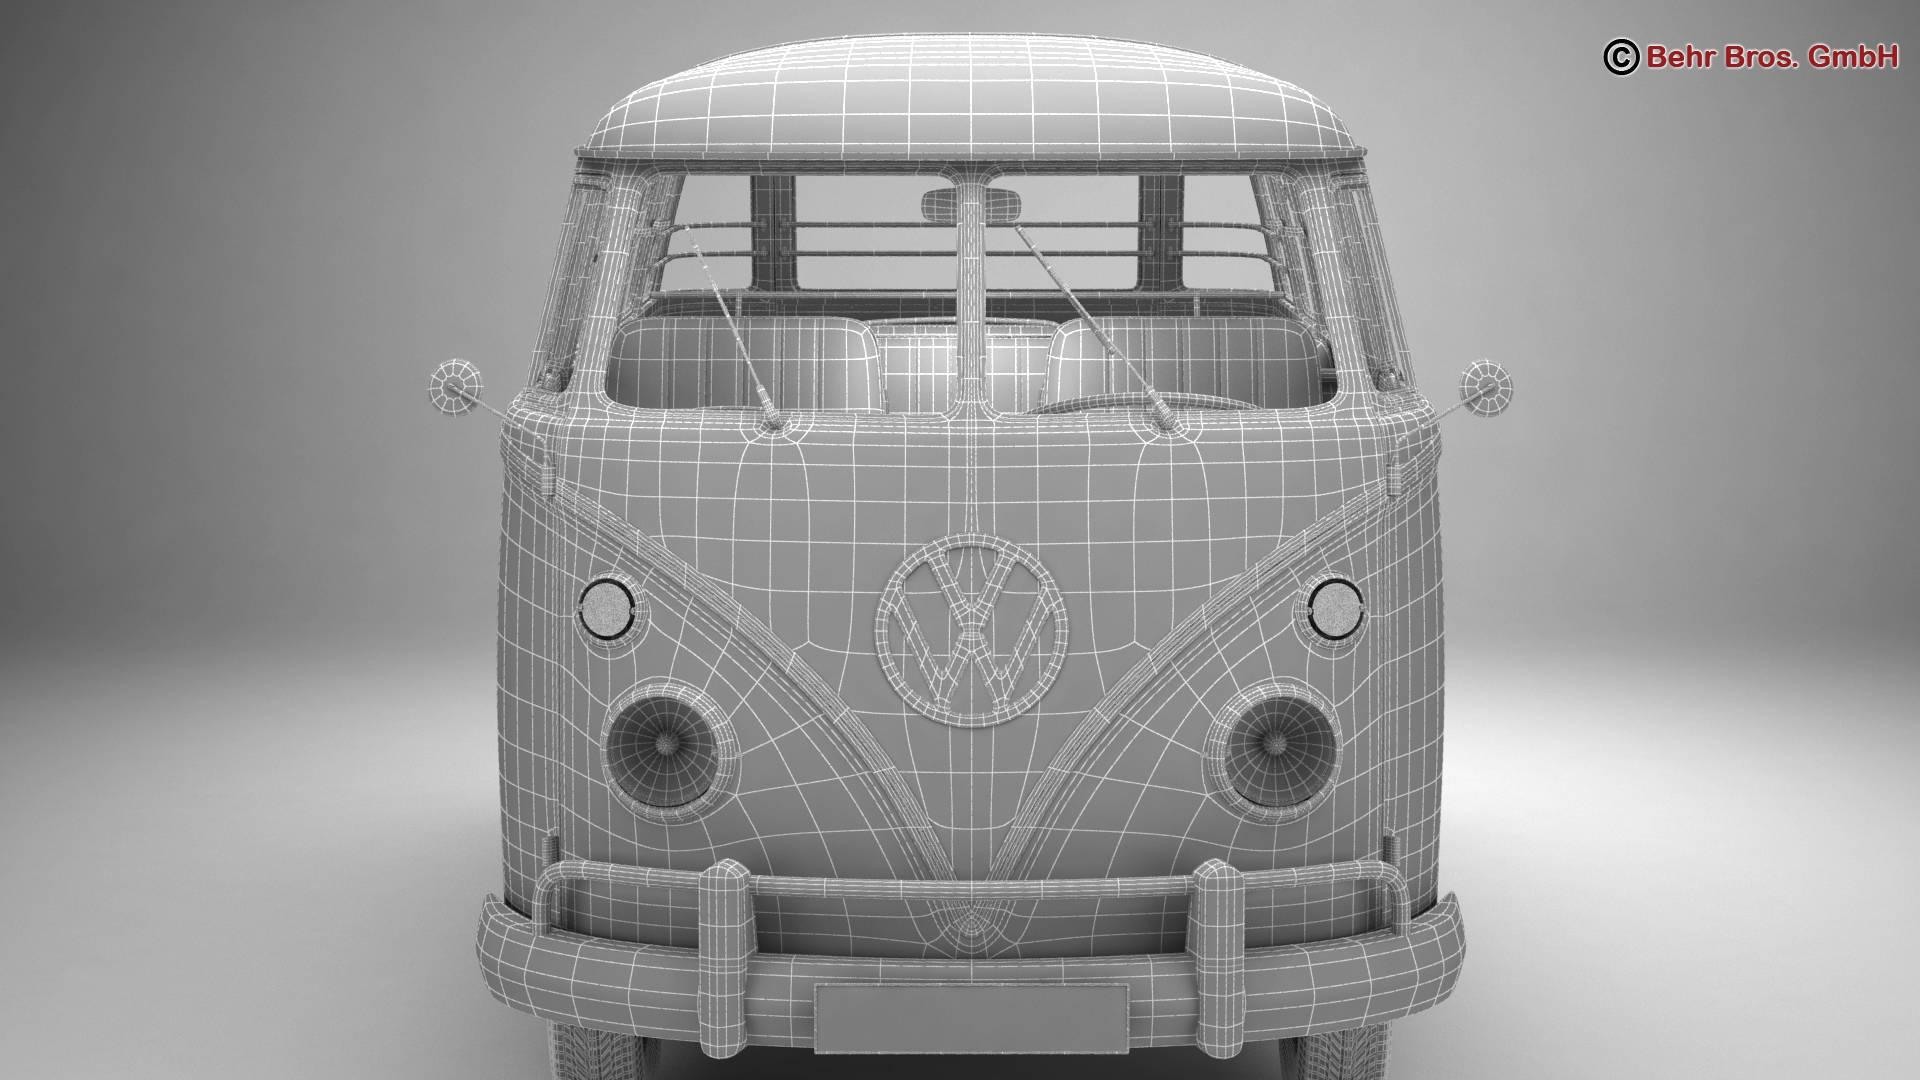 volkswagen type 2 samba 1963 hippie 3d model 3ds max fbx c4d lwo ma mb obj 217263